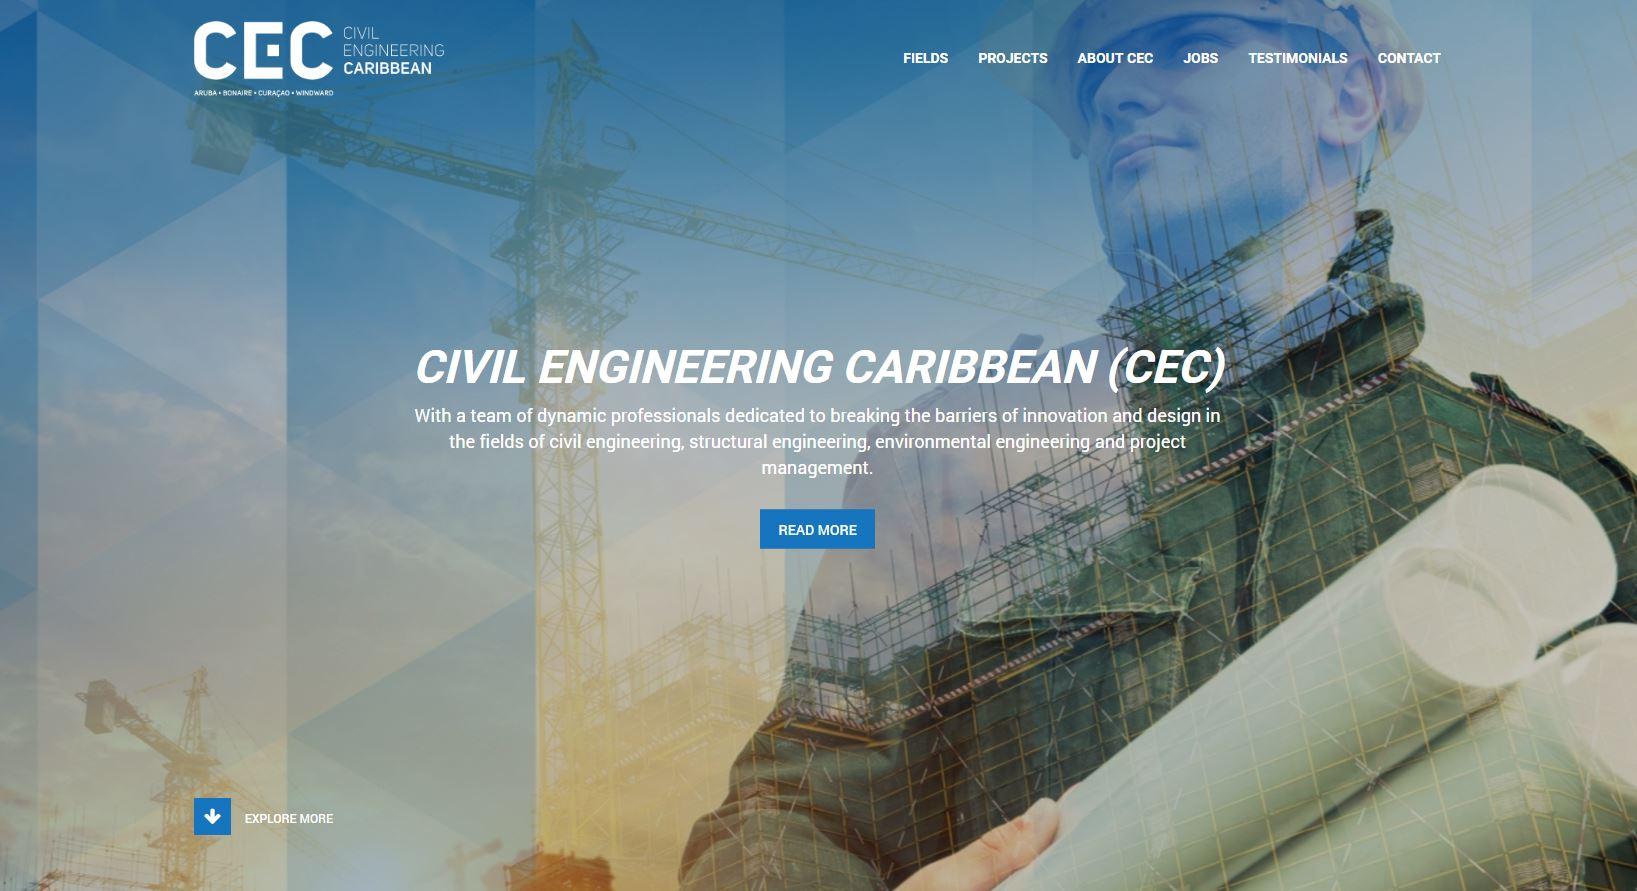 Civil Engineering Caribbean